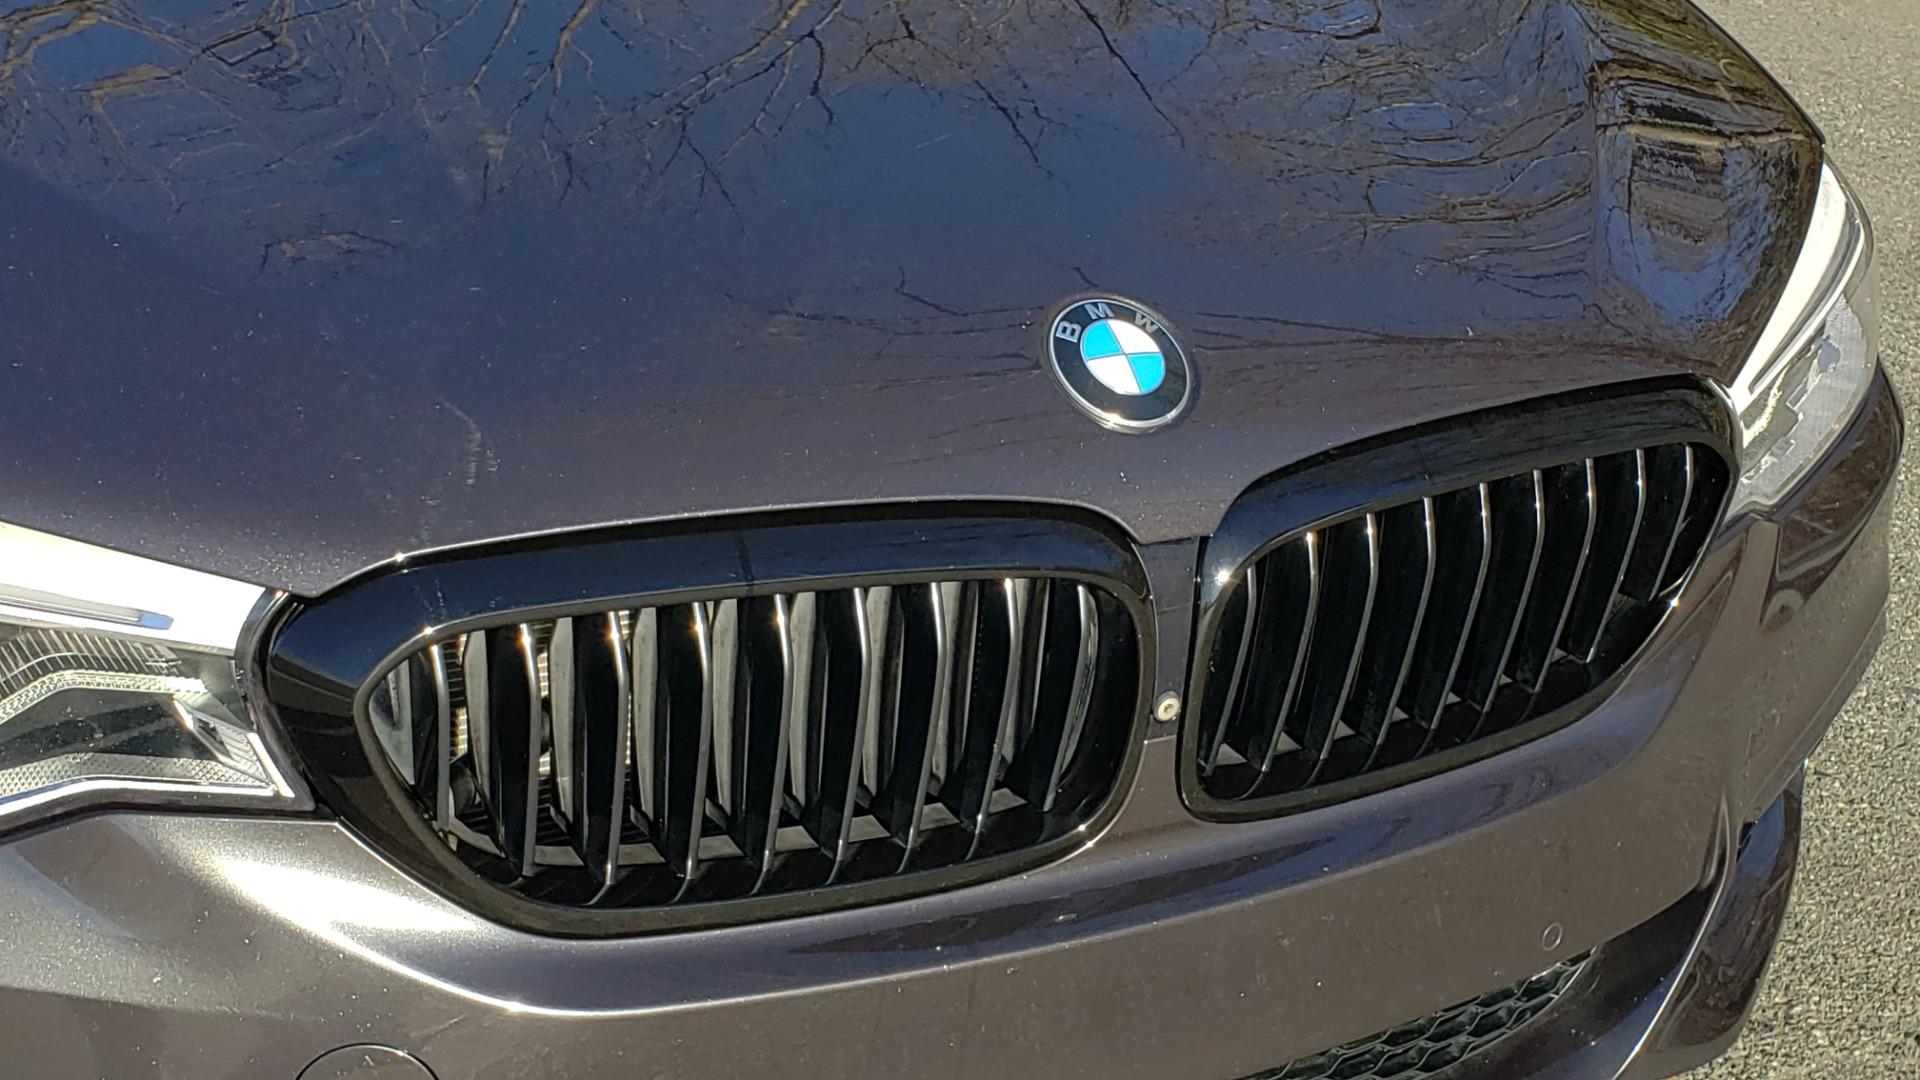 Used 2018 BMW 5 SERIES 540I M-SPORT / DRVR ASST / EXEC PKG / NAV / SUNROOF / HUD / REARVIEW for sale Sold at Formula Imports in Charlotte NC 28227 21